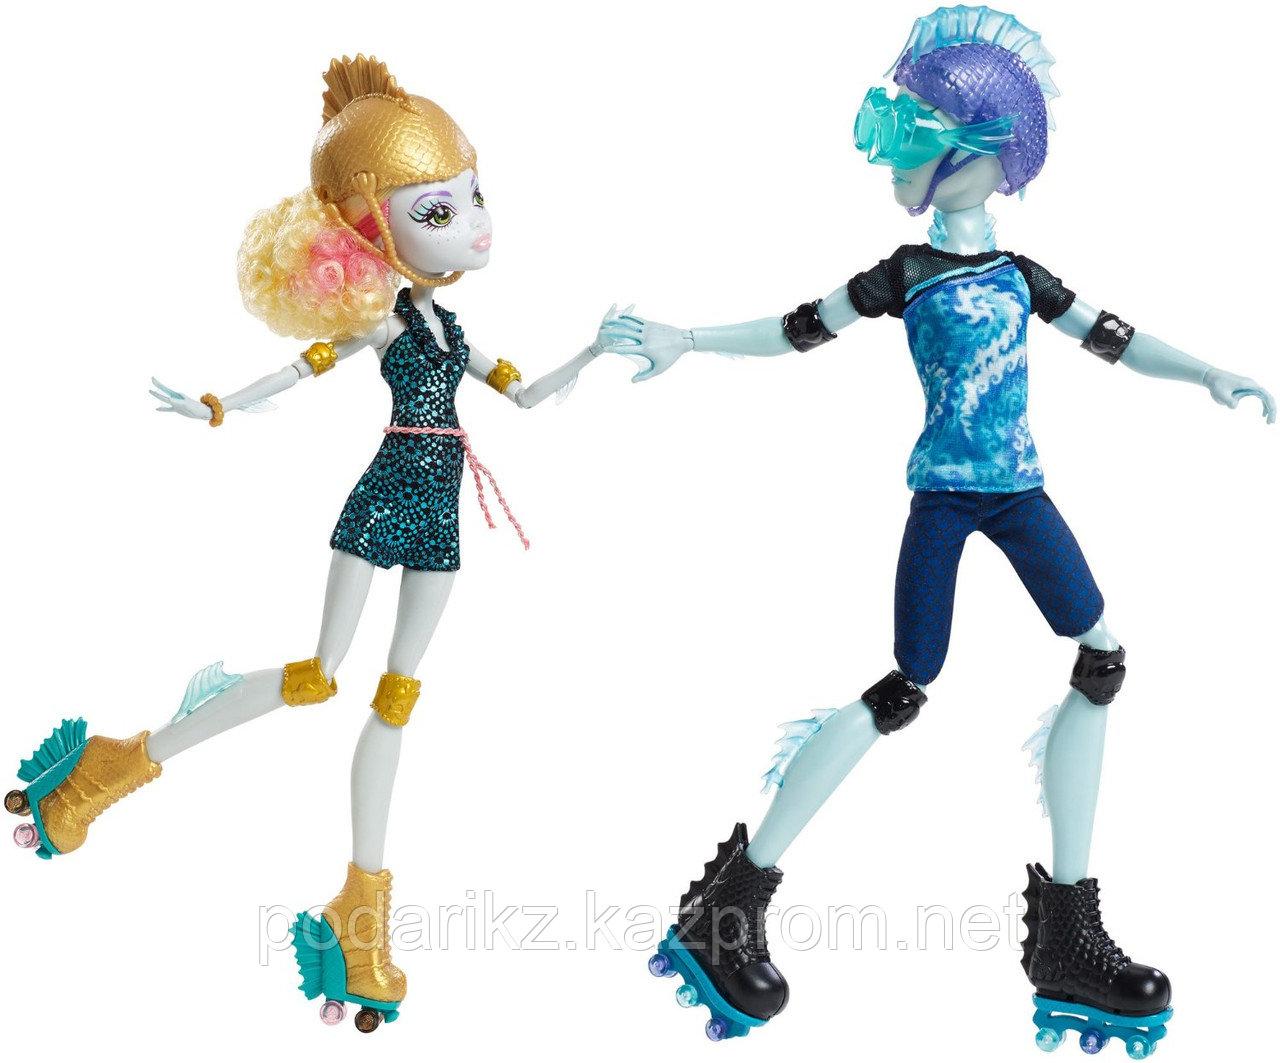 Monster High Гил и Лагуна, Lagoona Blue и Gil Weber - фото 3